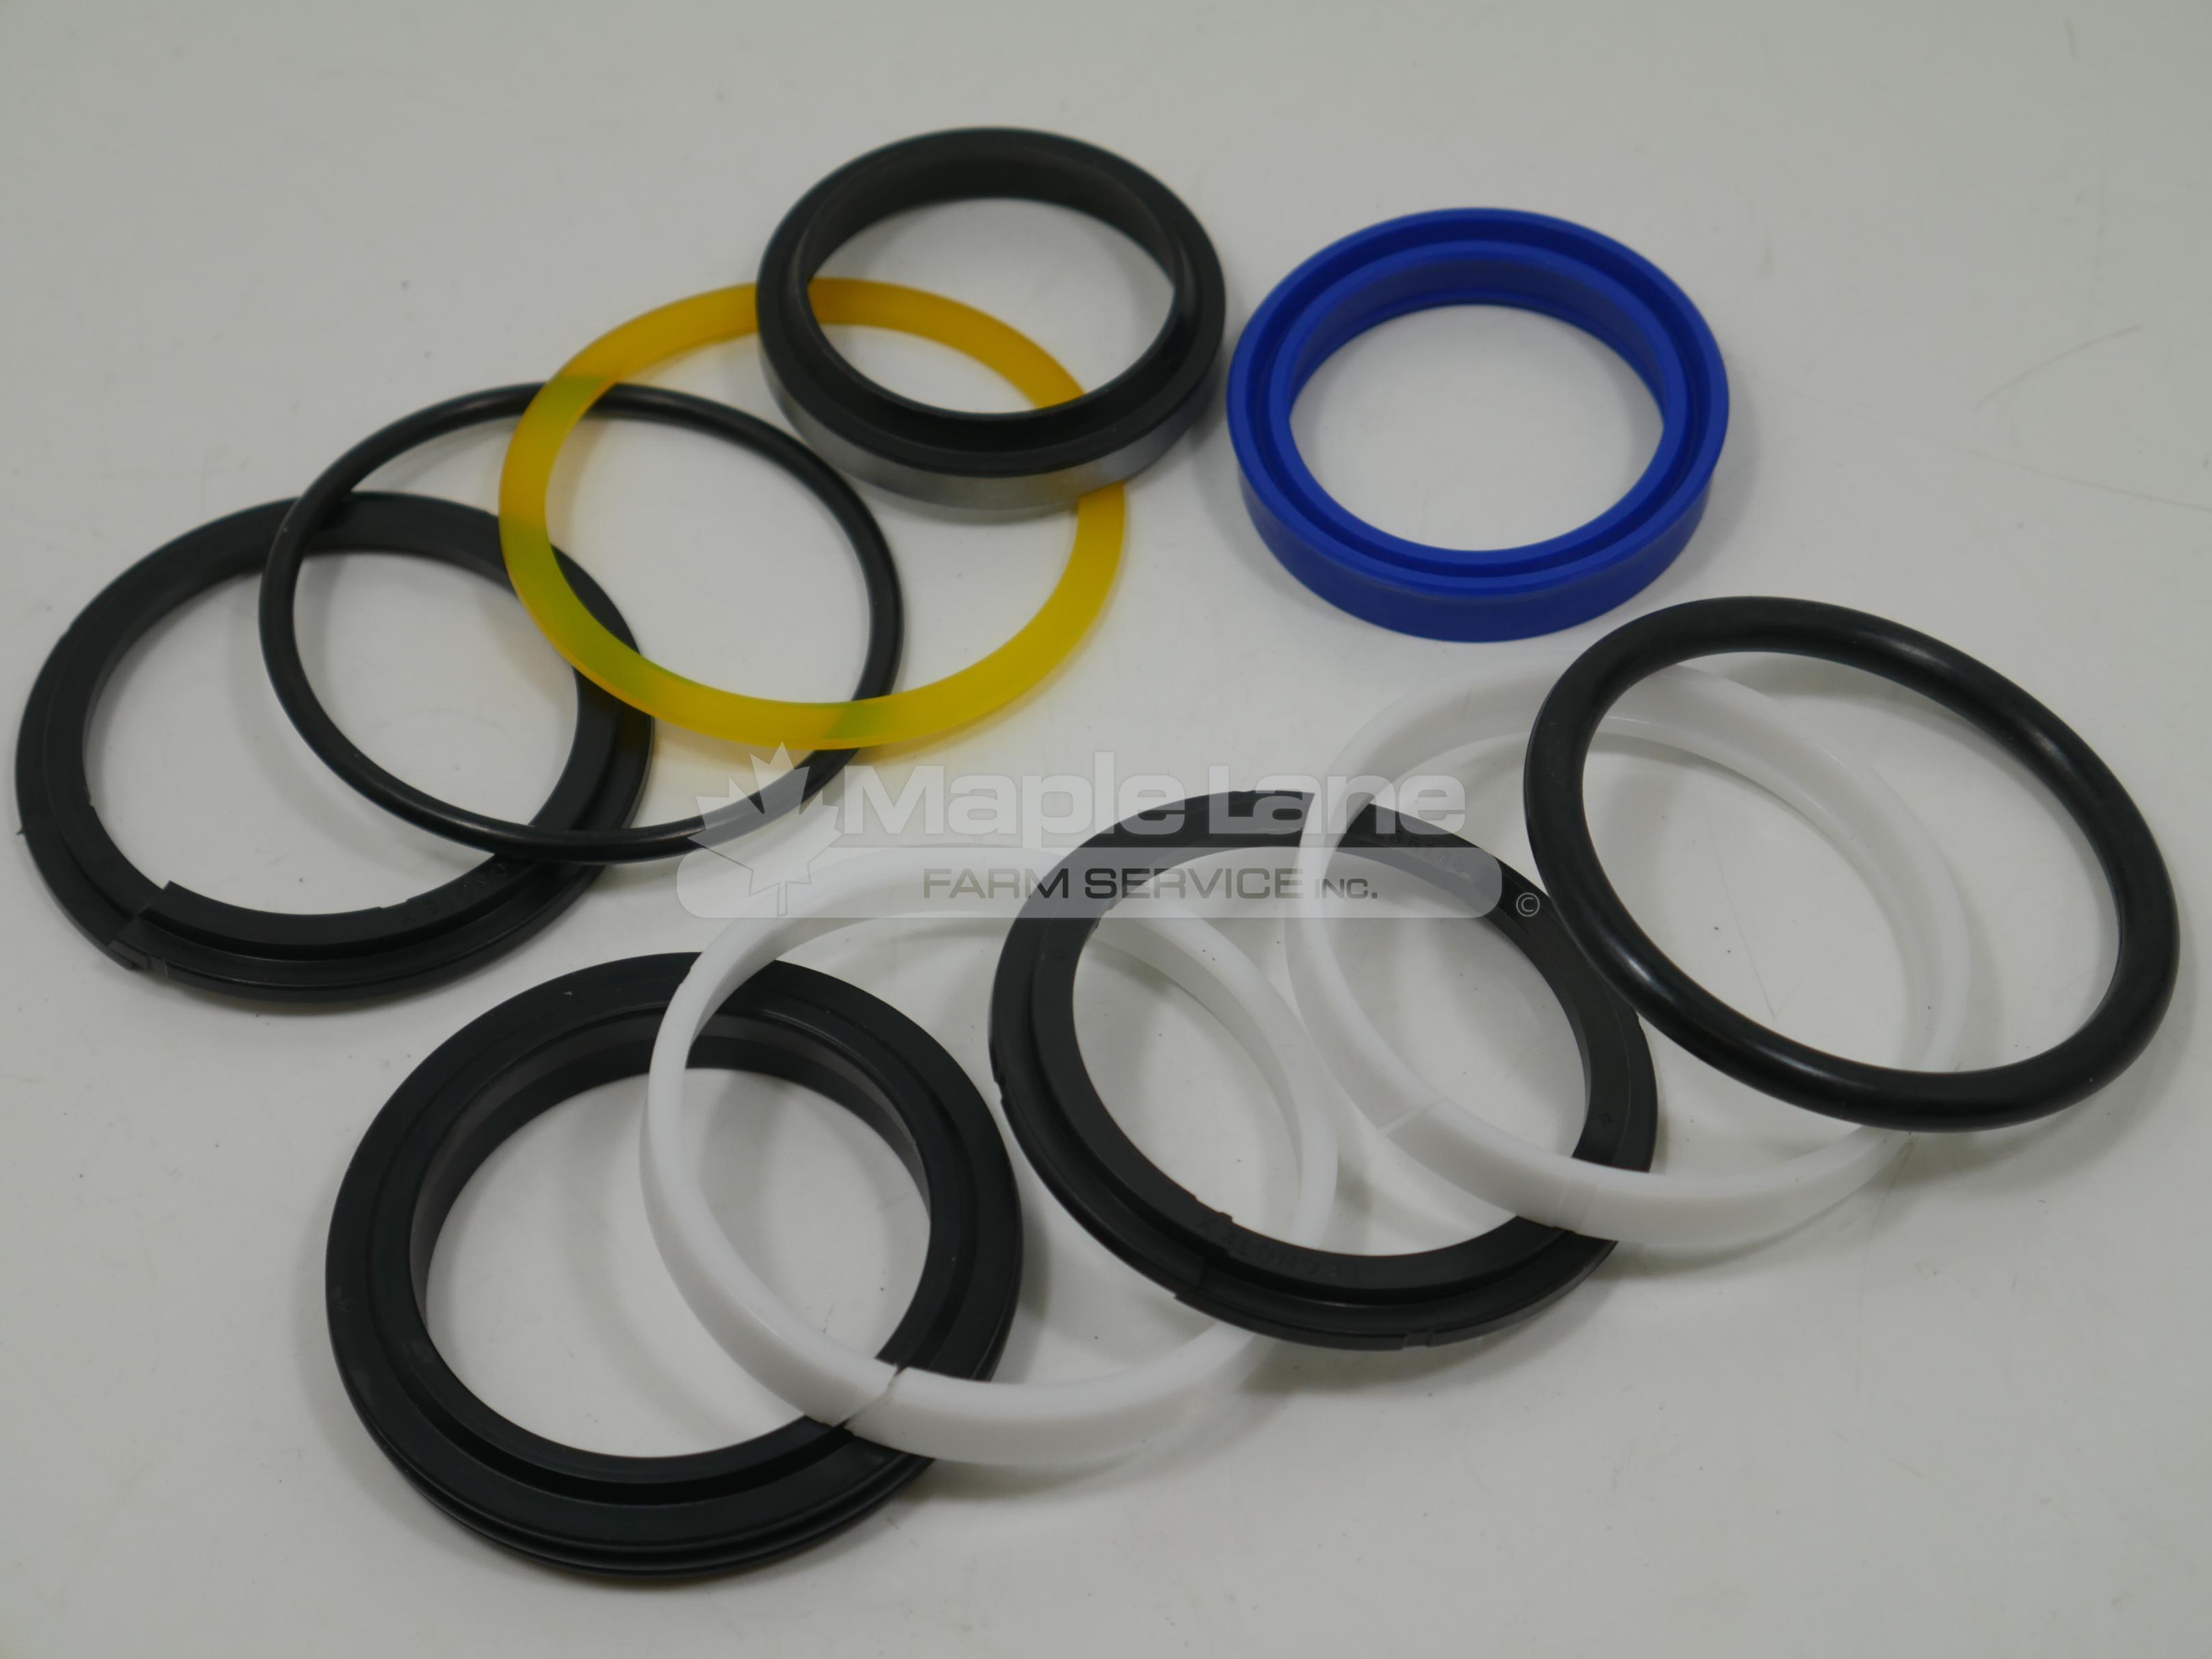 AL5036155 Seal Assembly Kit